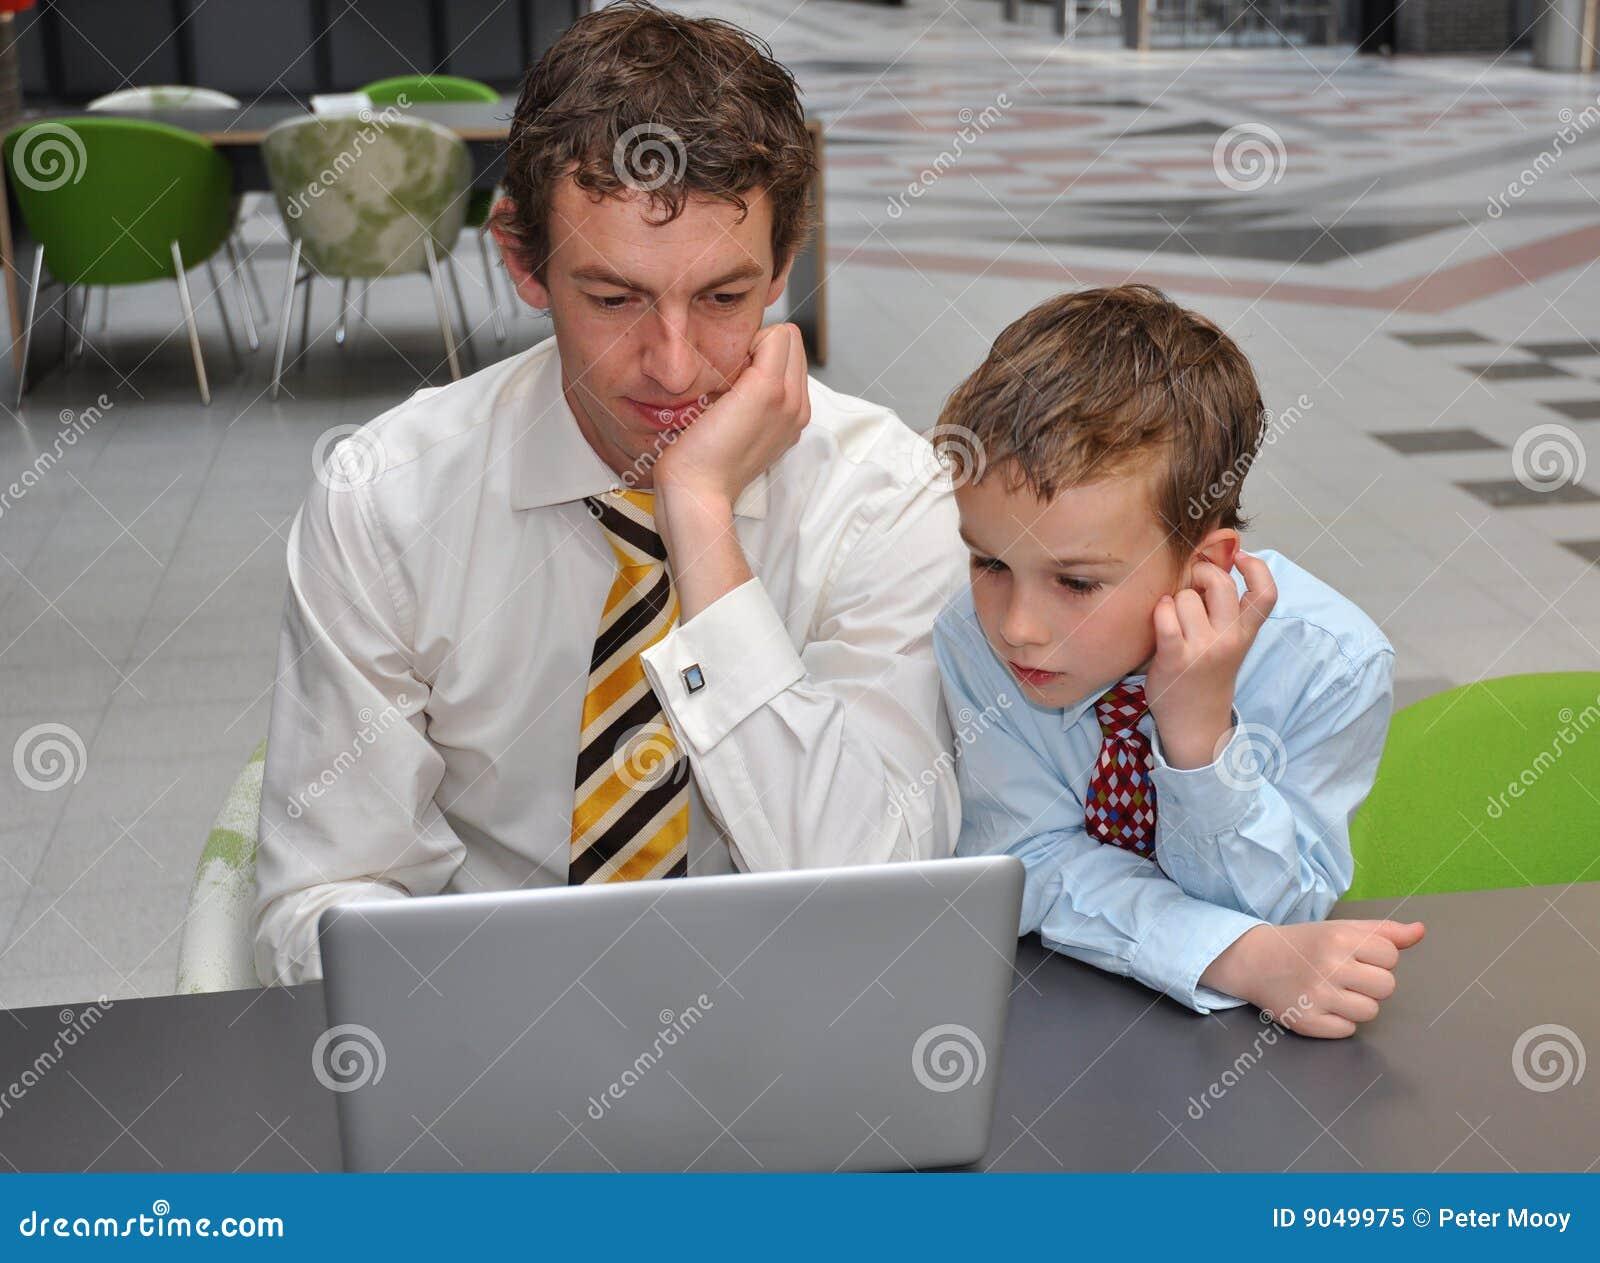 Men preparing presentation